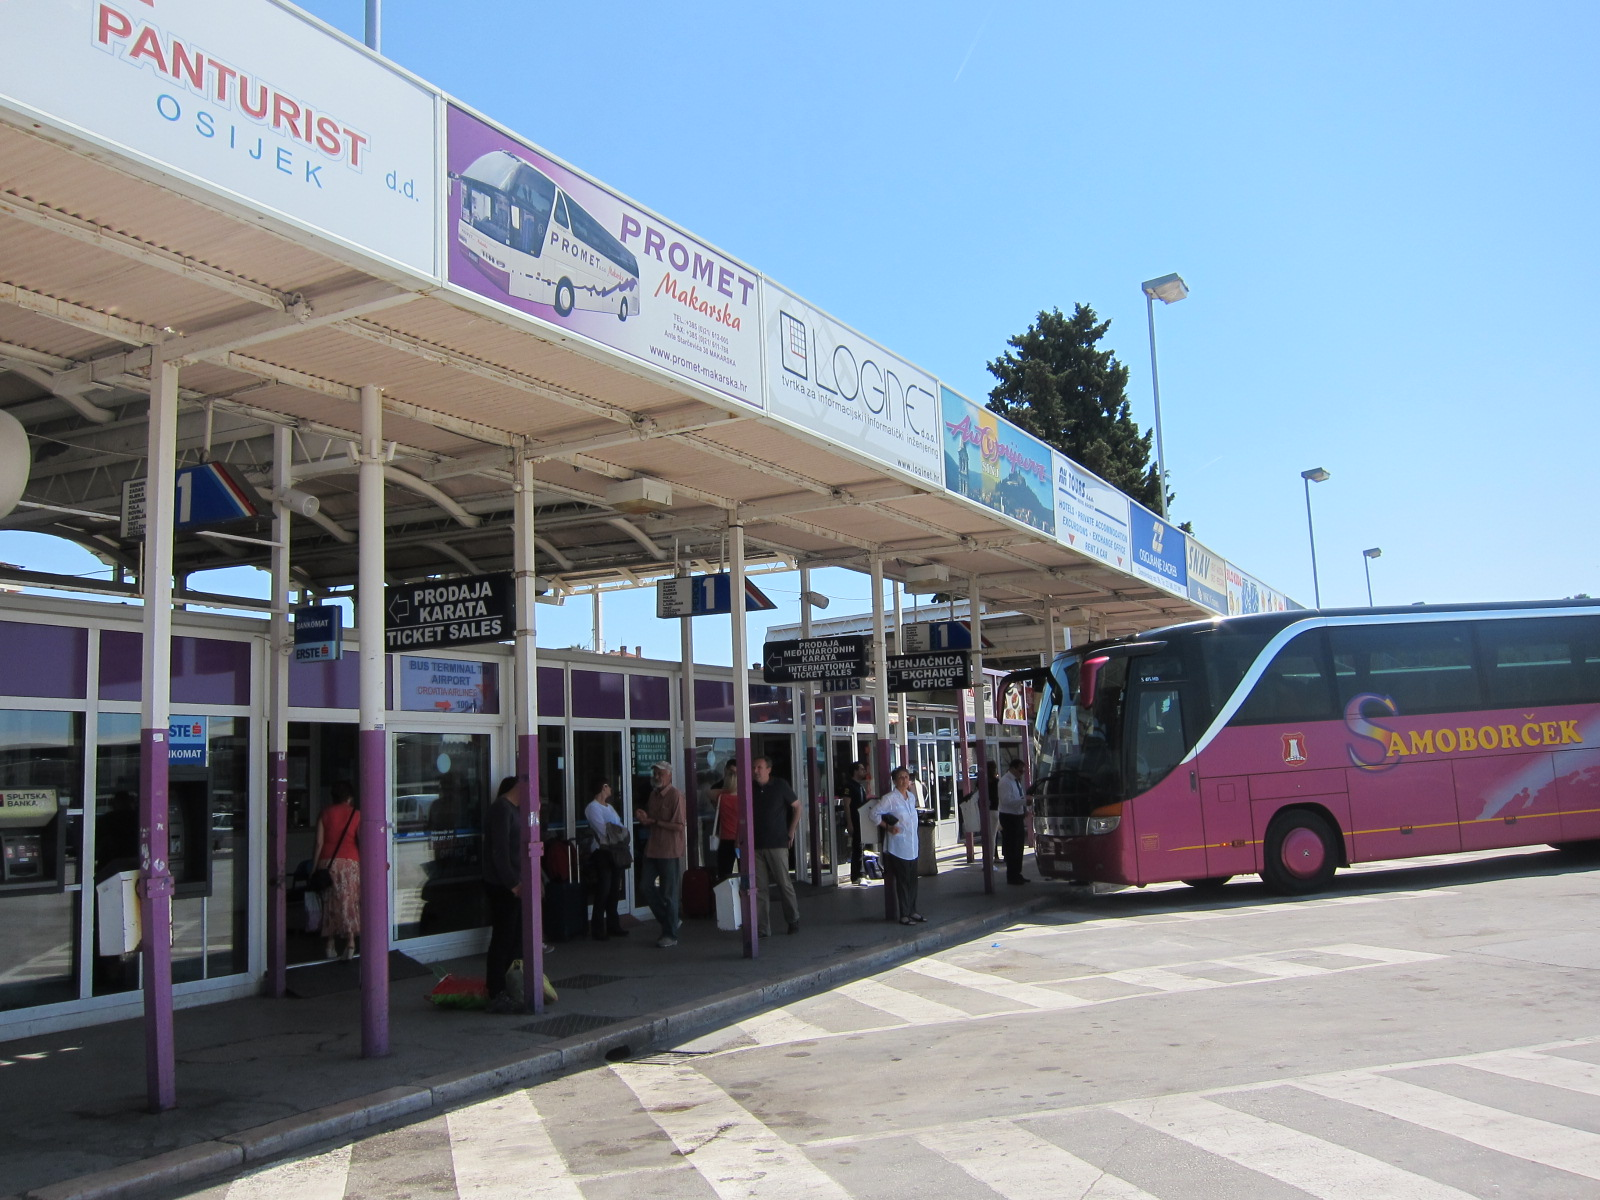 Bus Travel in Croatia